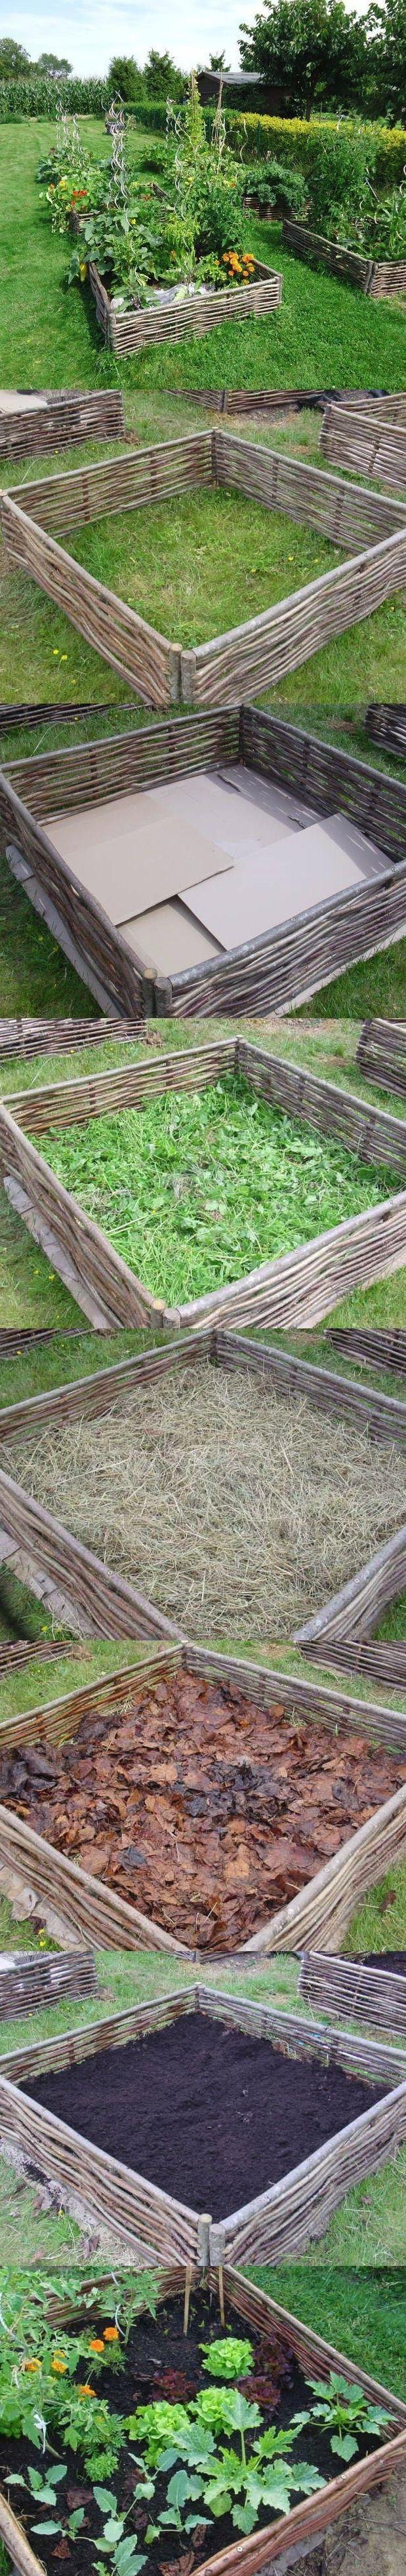 Lasagna Bed gardening